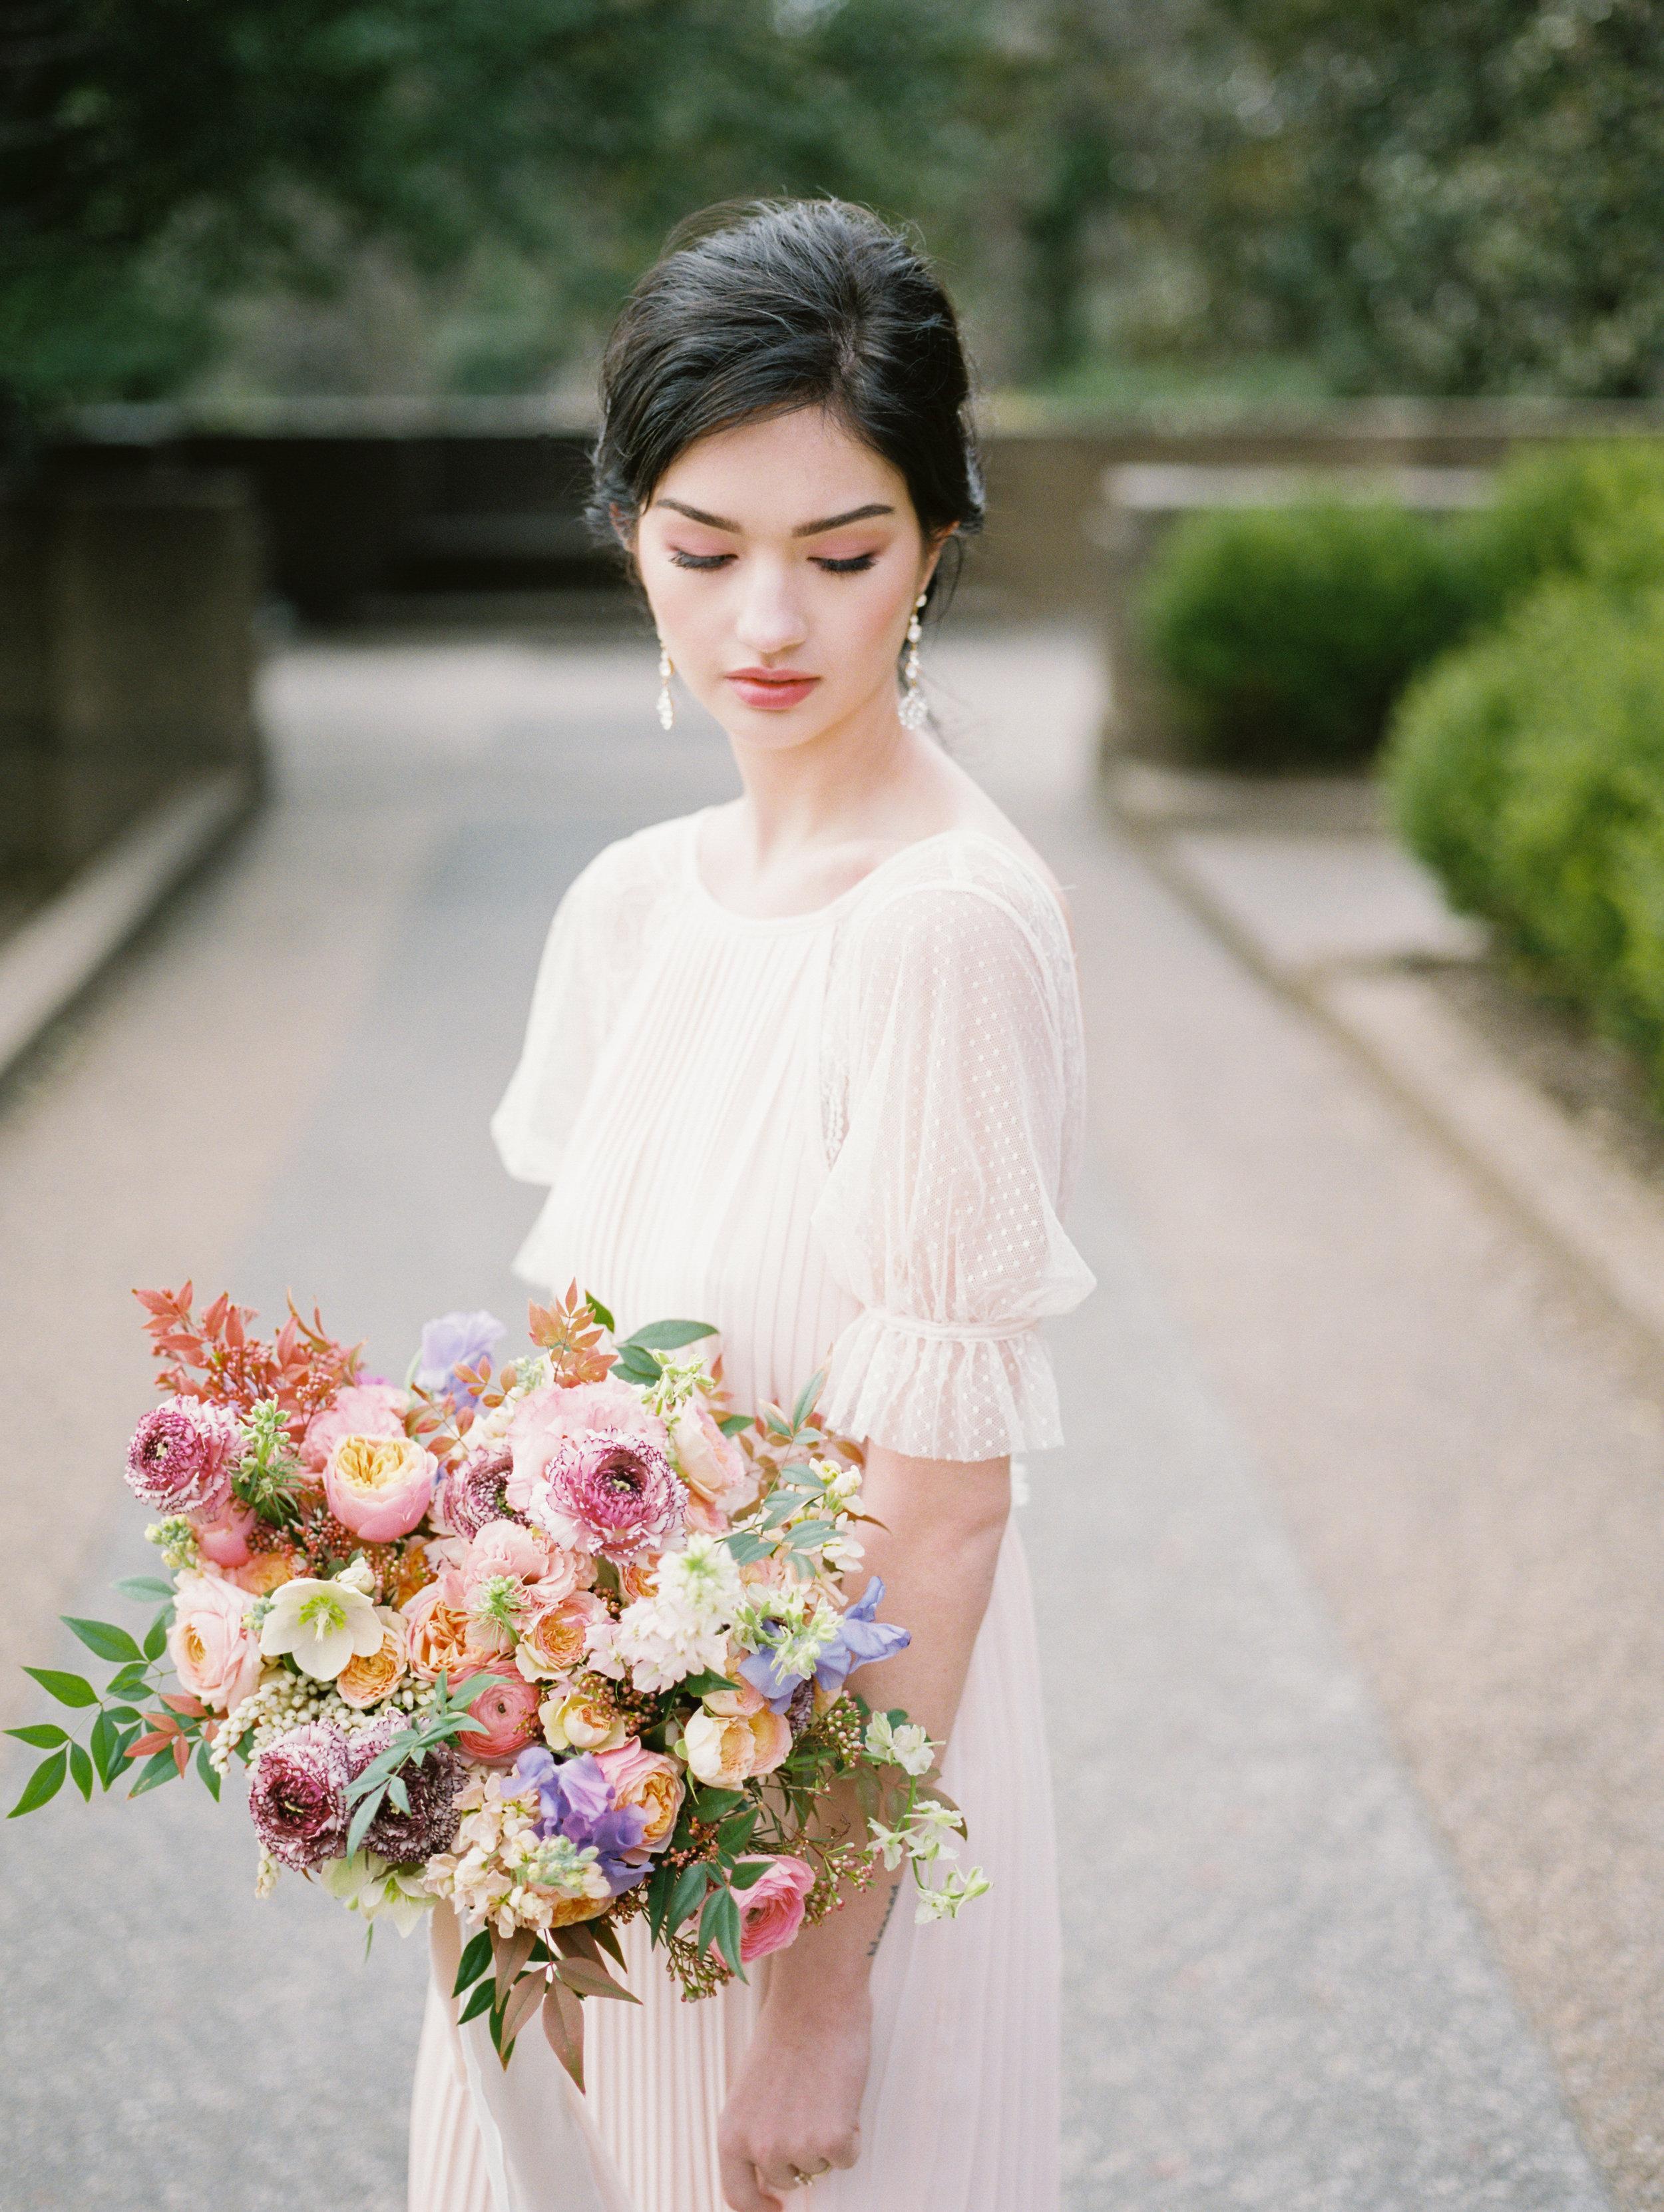 erica-basha-bridal-dc-makeup-artist